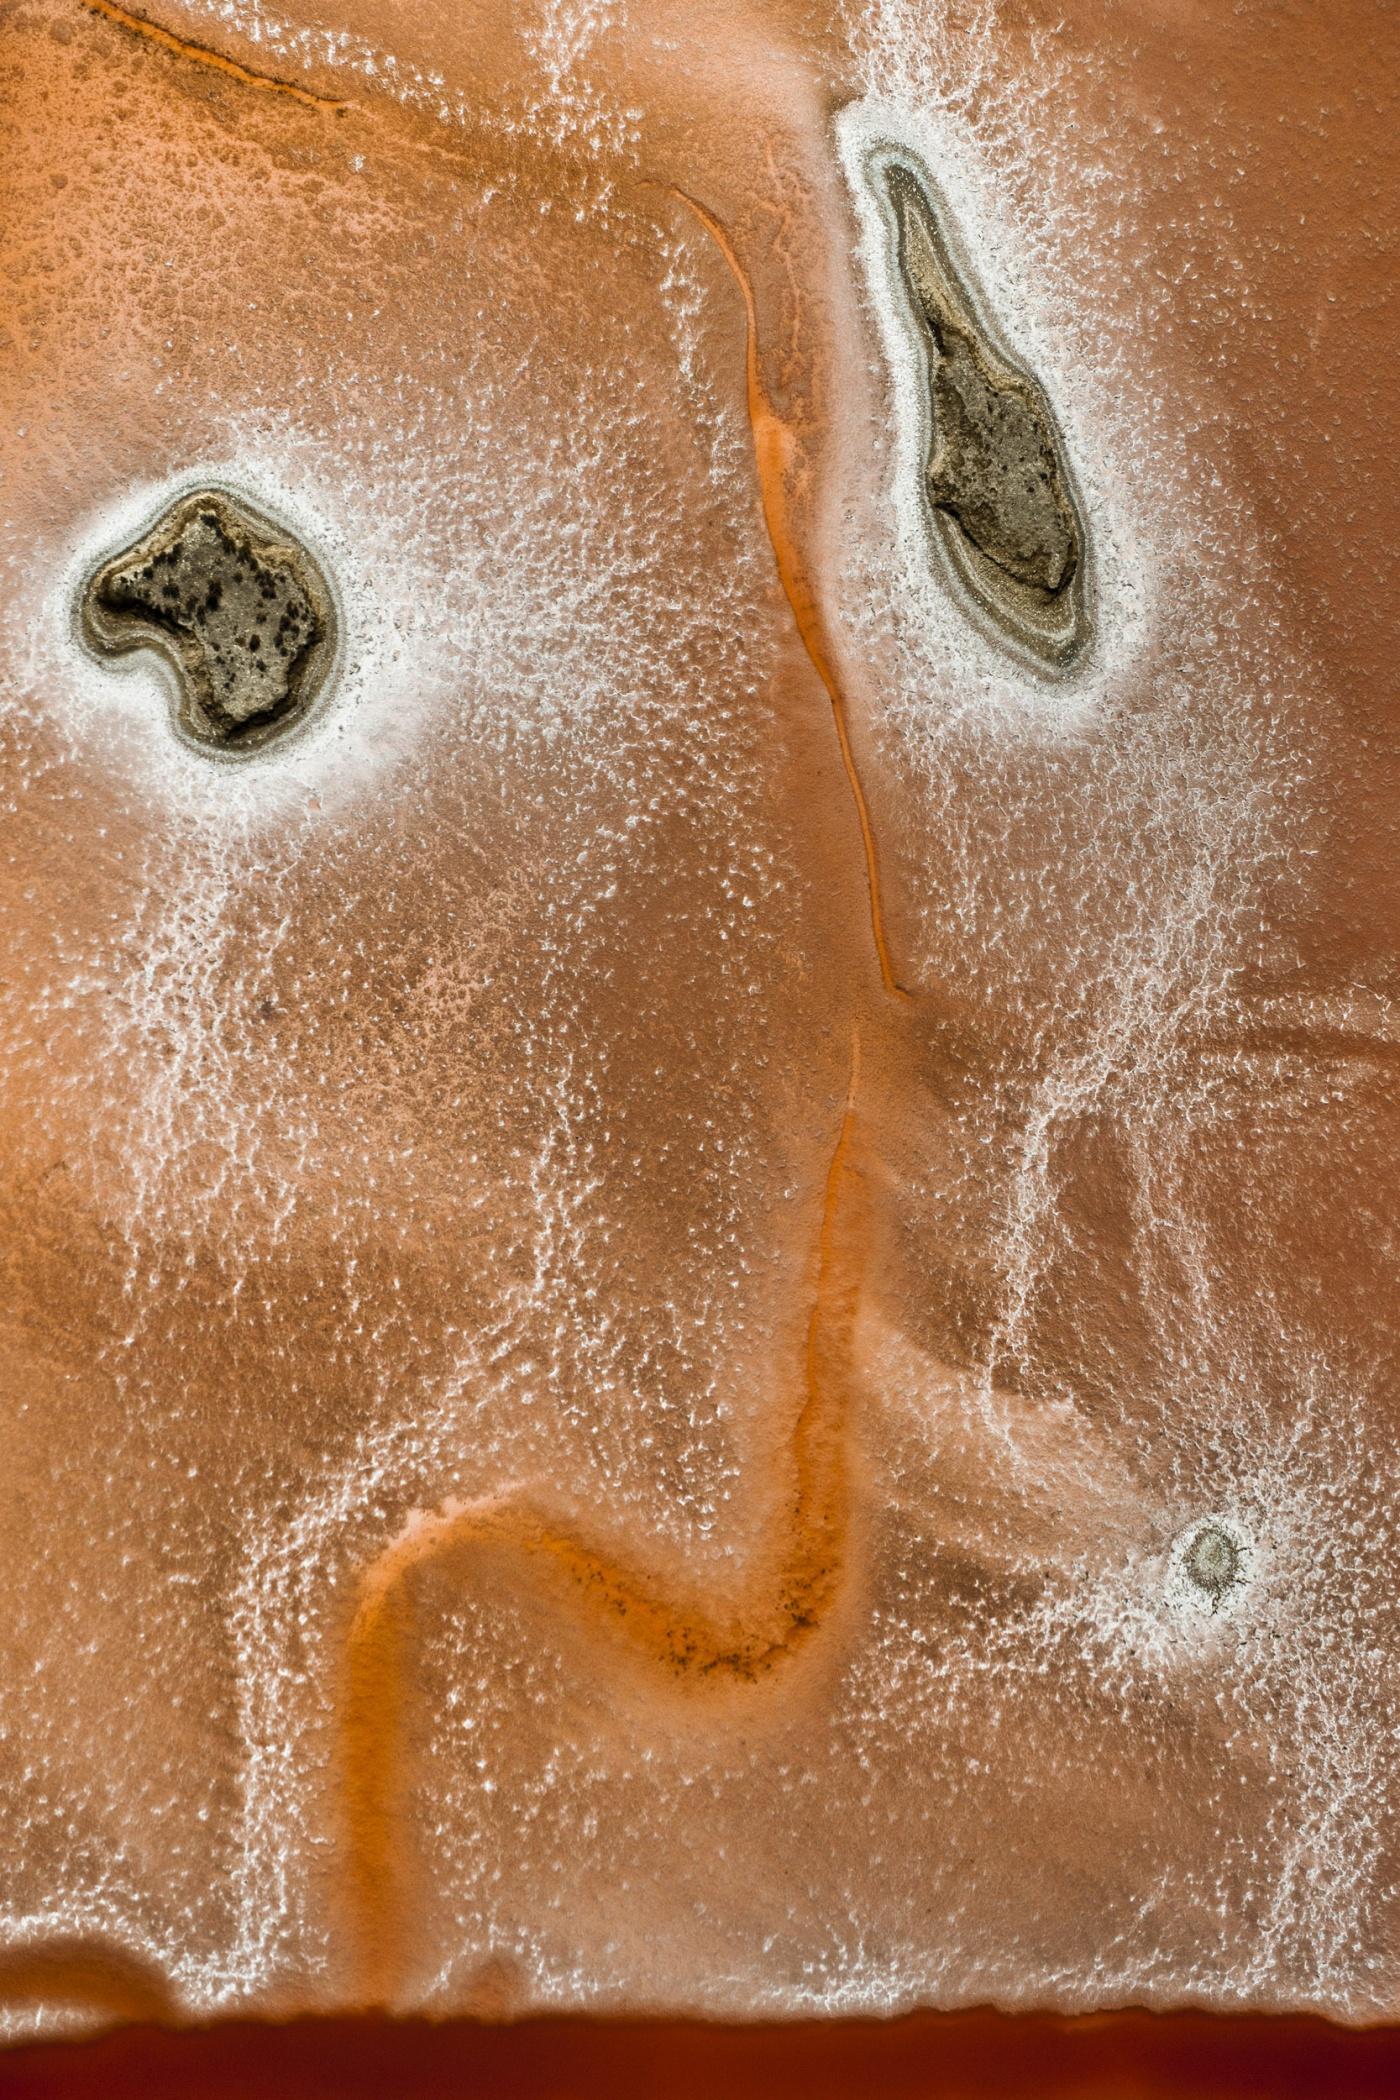 Lágrima de un hombre meditabundo - Author series 1. Fractals - Hector Garrido, Aerial and human photography